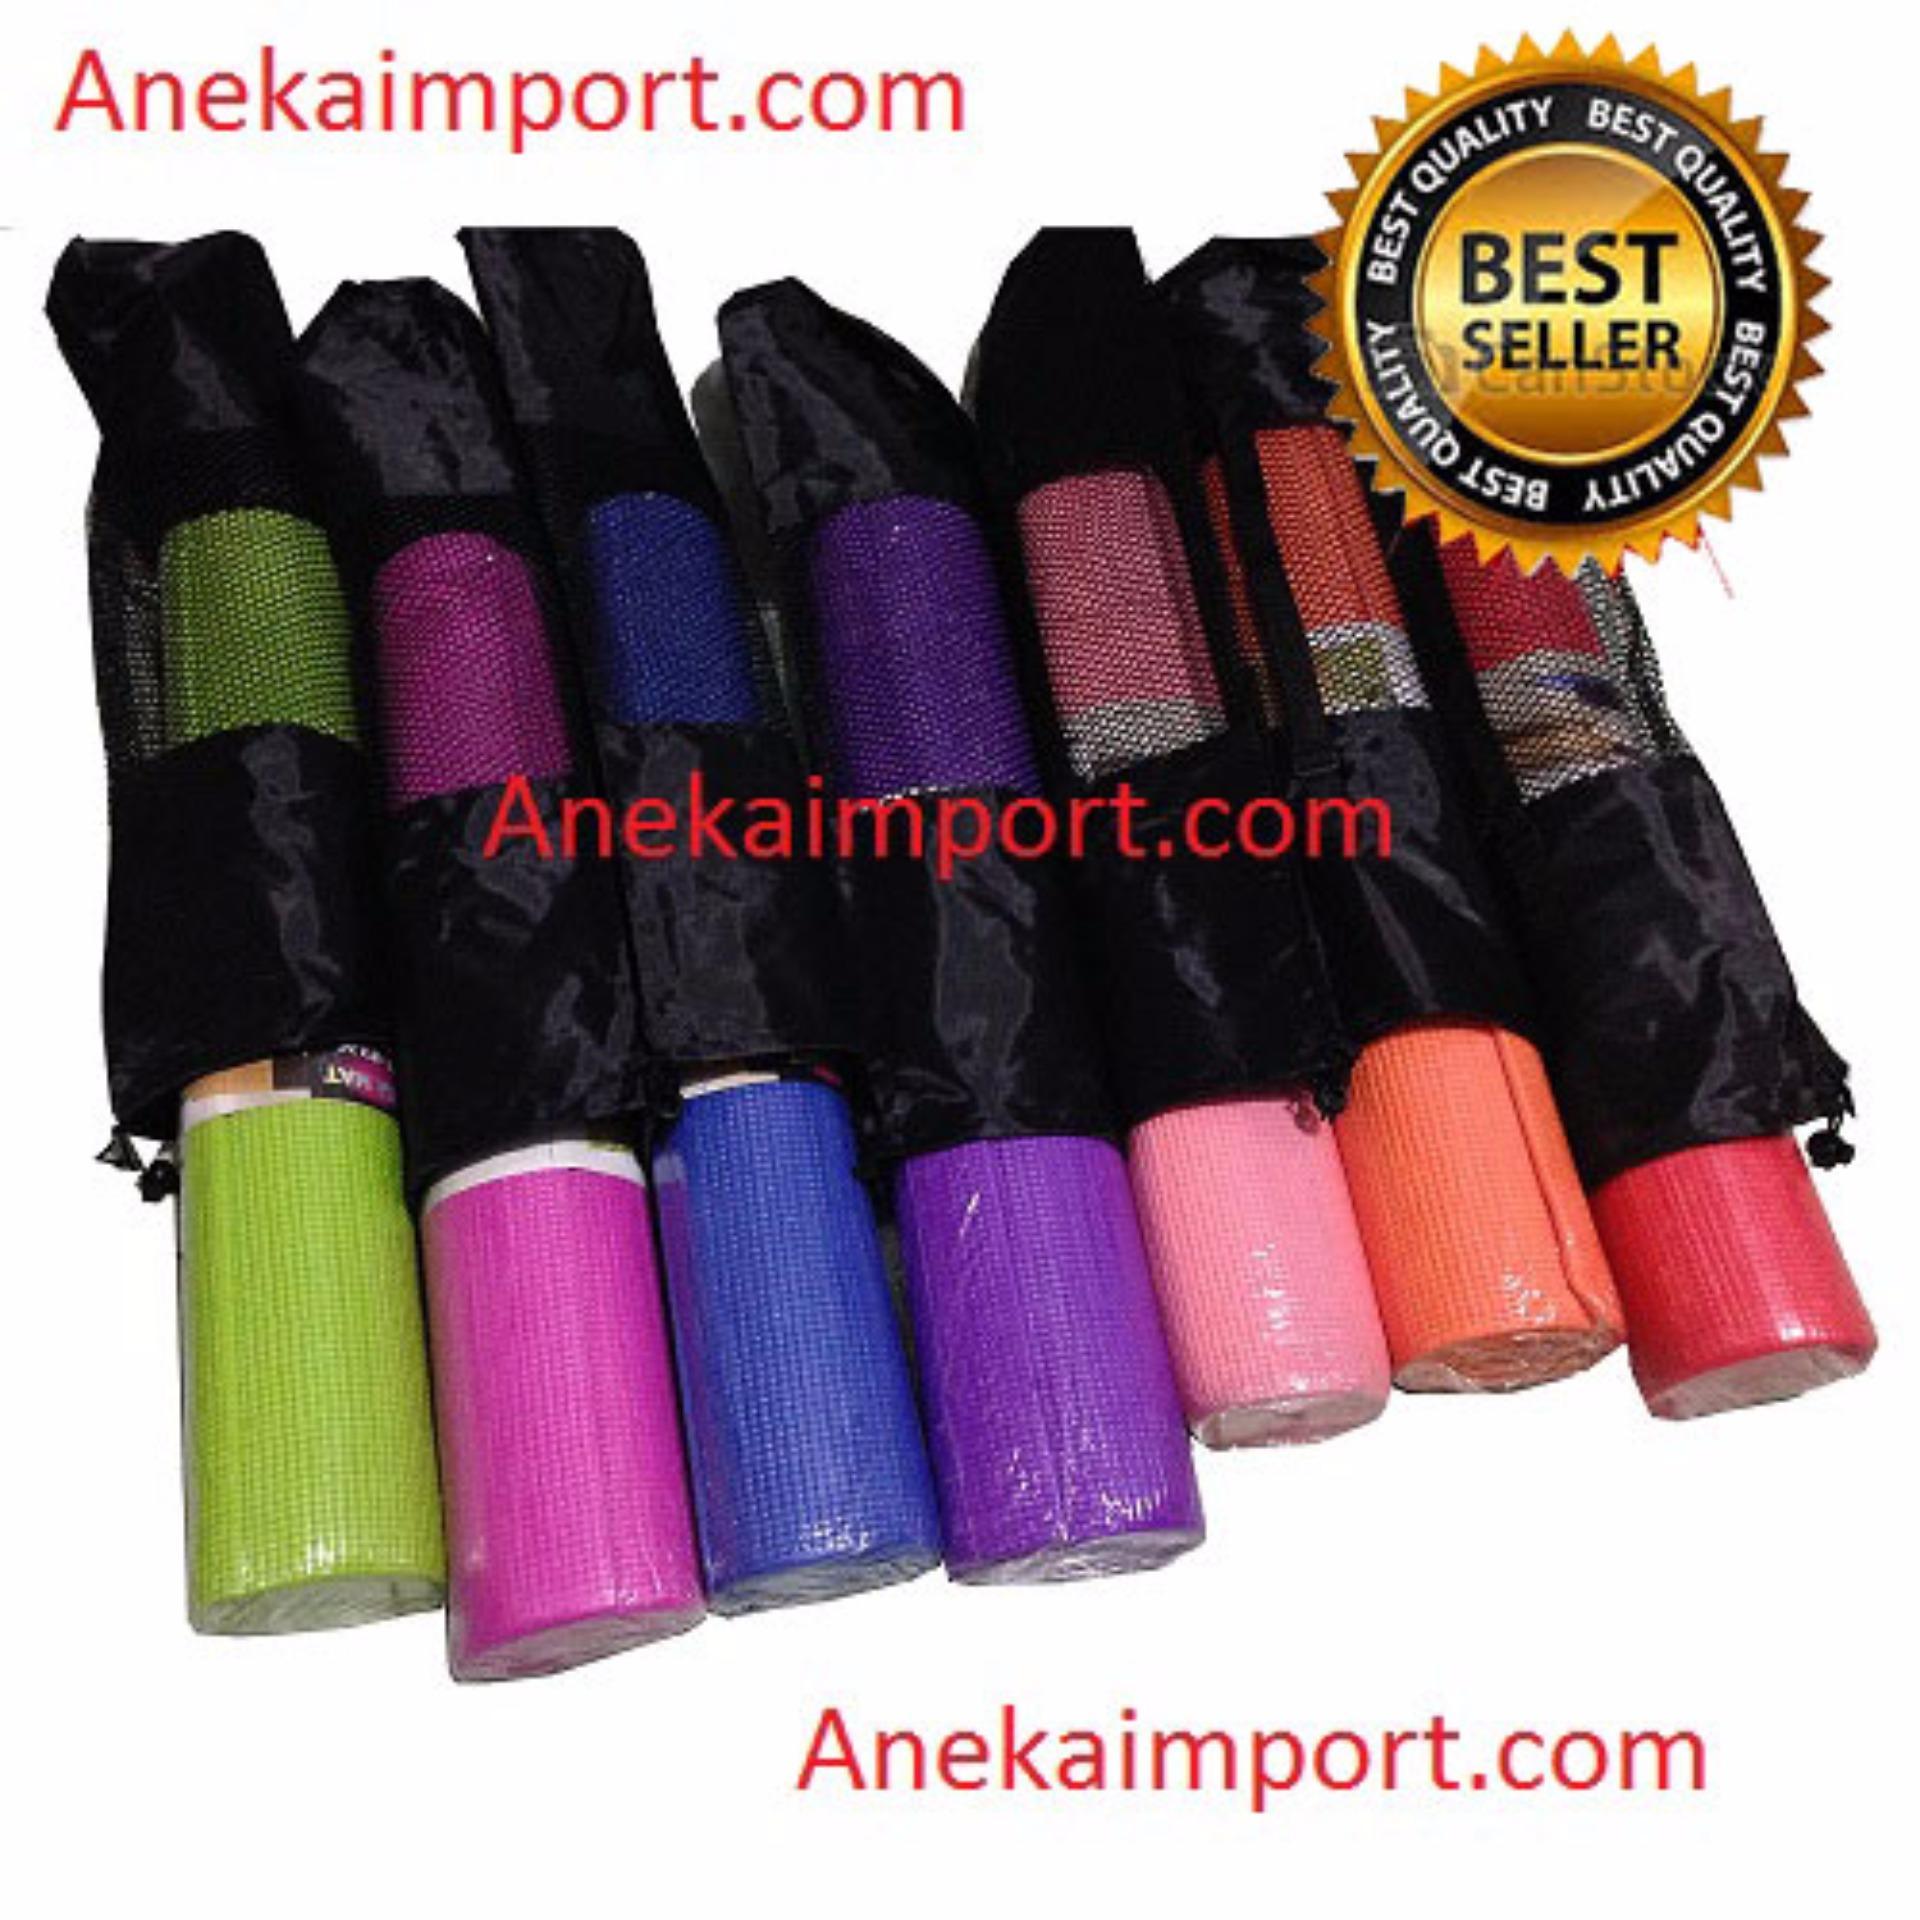 Spesifikasi Anekaimportdotcom Matras Yoga Yoga Mat Pilates Mat Pink Gratis Yoga Bag Bagus